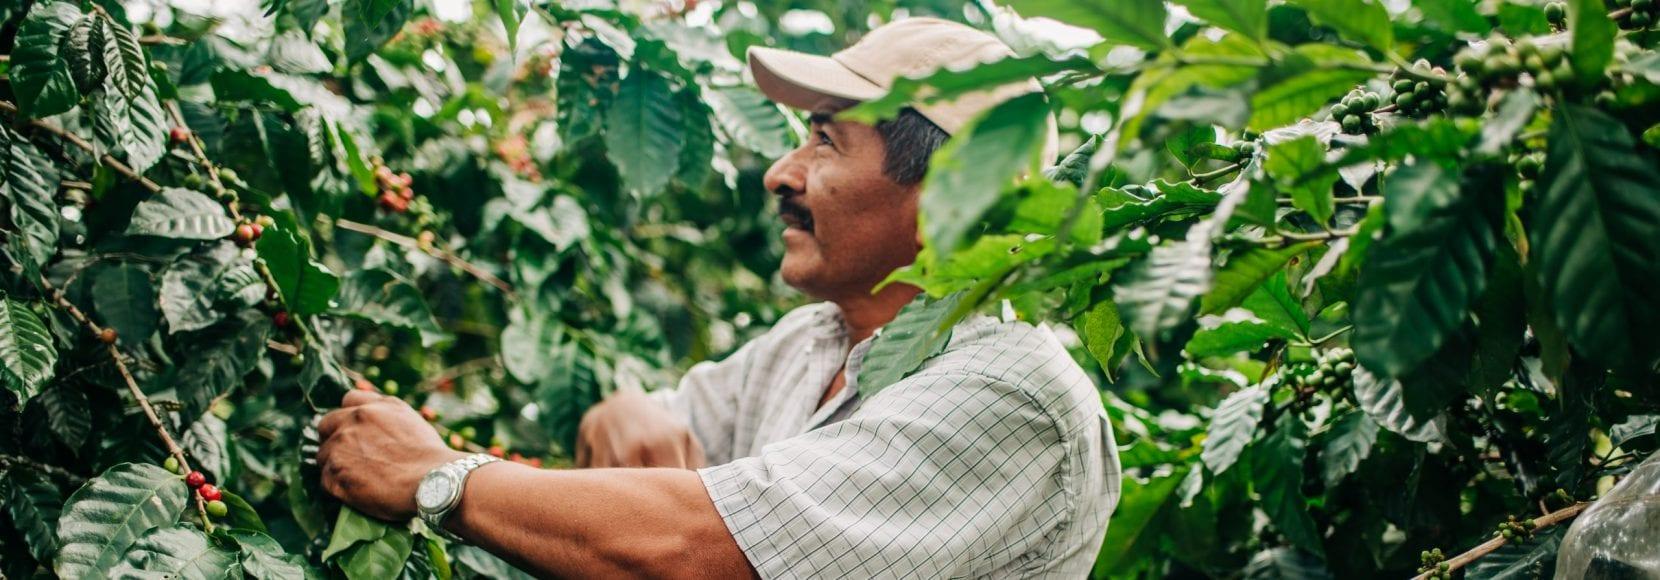 Farmer harvesting crop